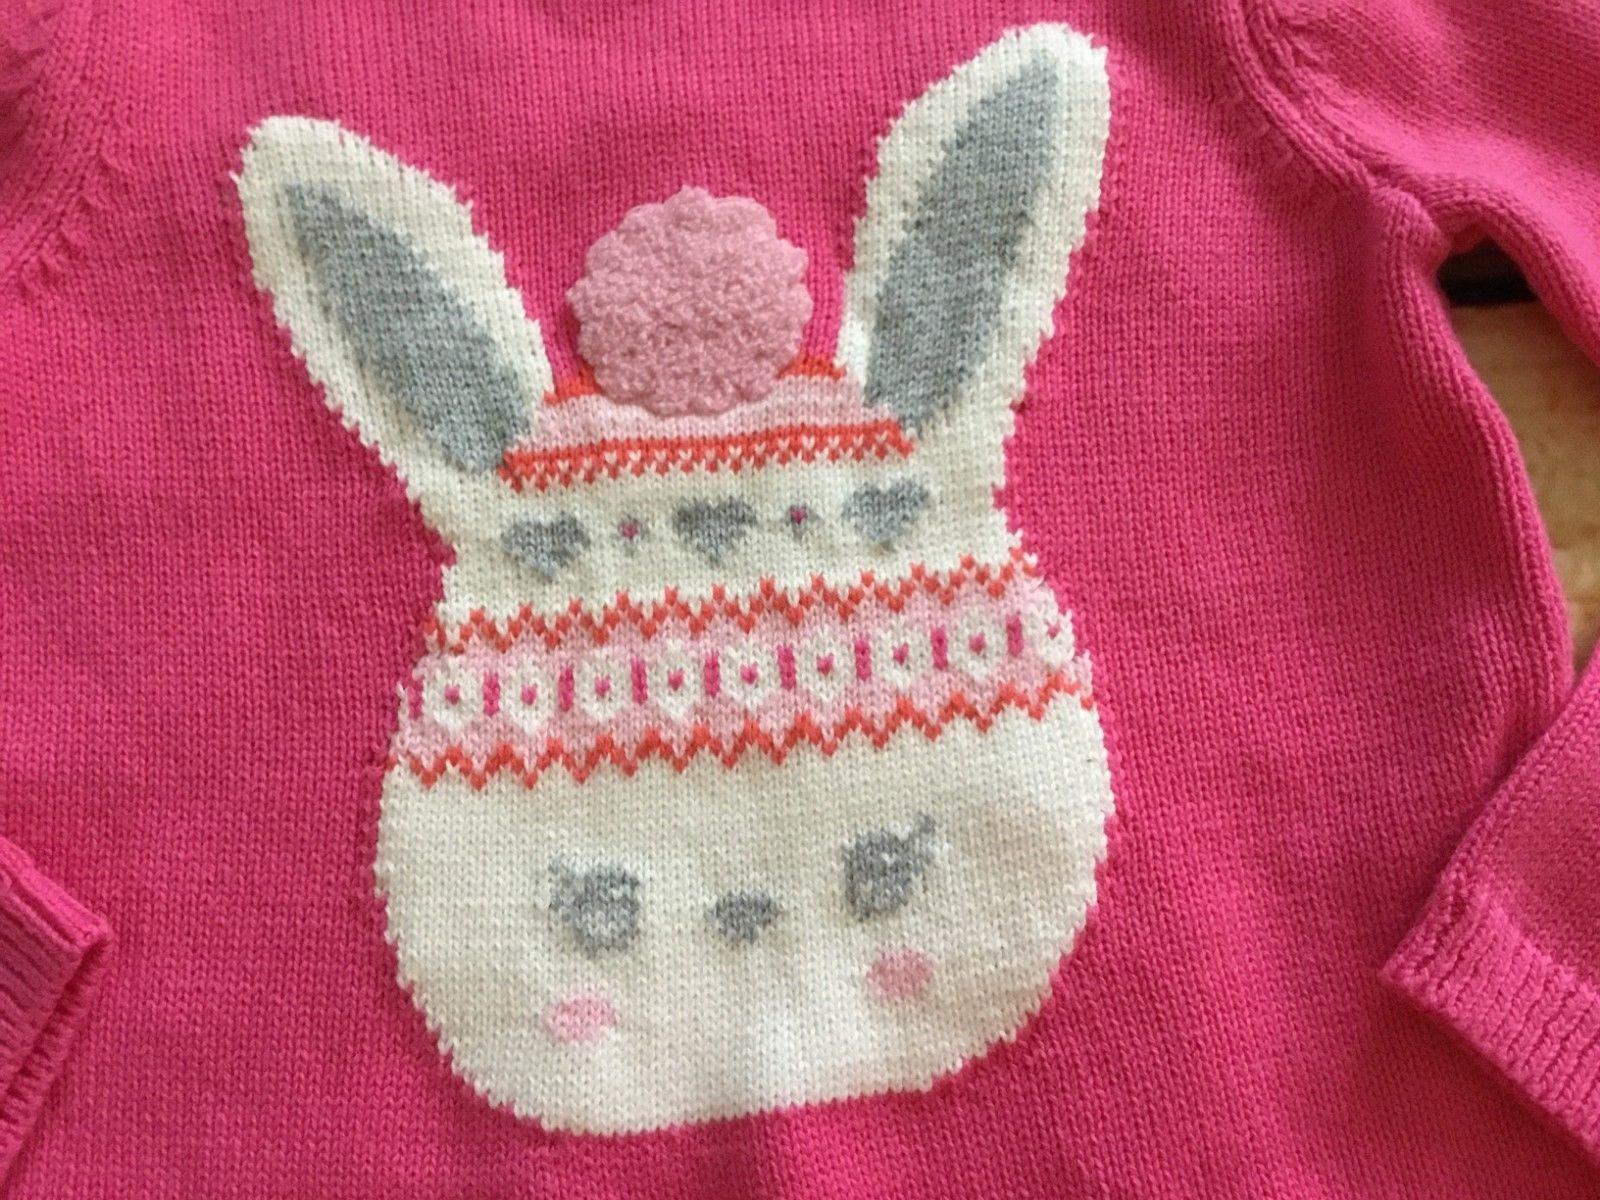 NWT Gymboree Fair Isle Flurry Pink Bunny Sweater Dress Girls Size 3t